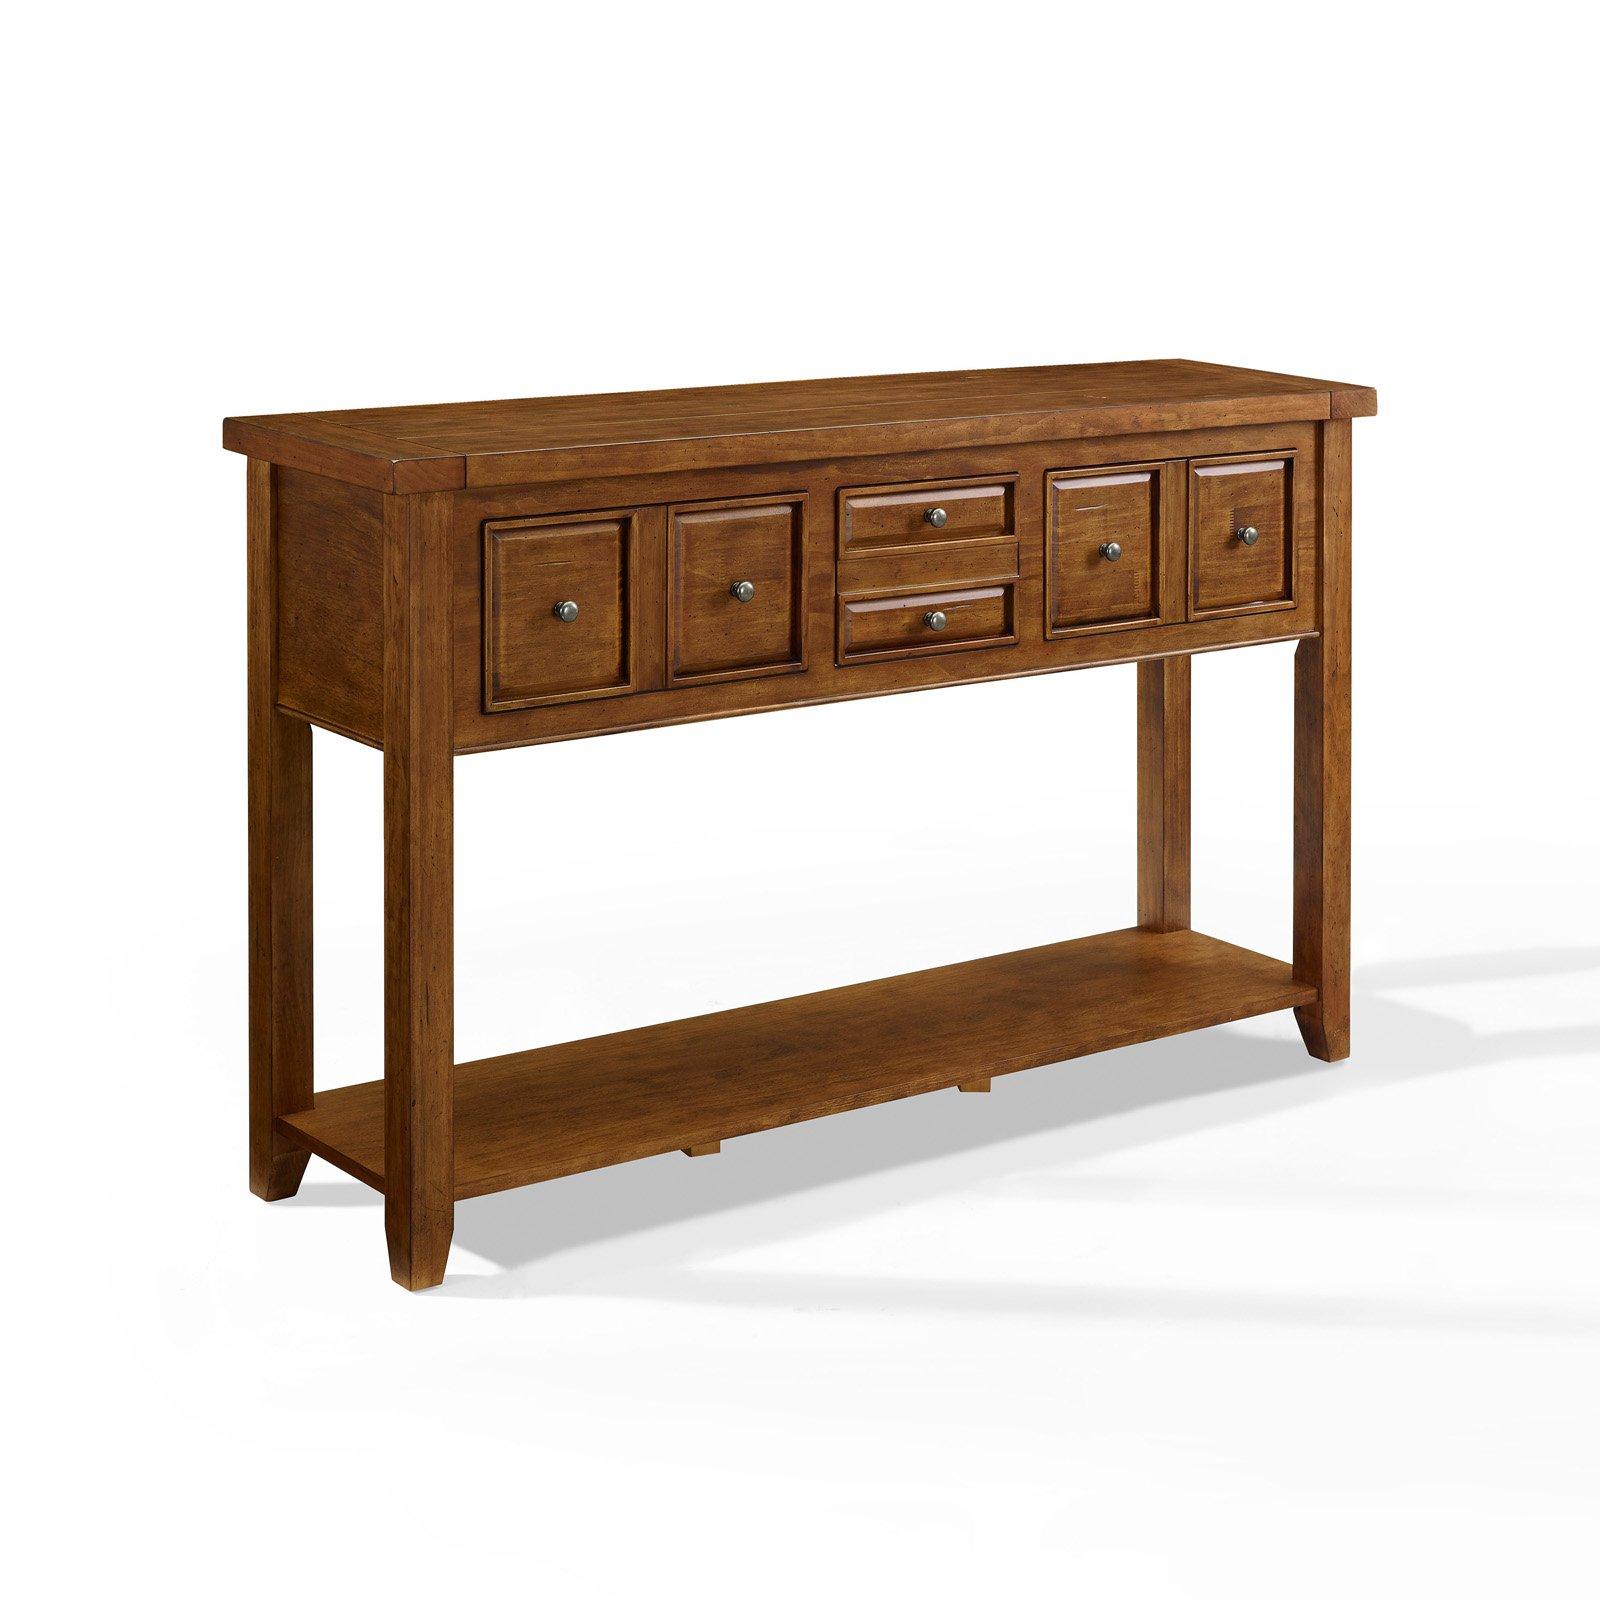 Crosley Furniture Sienna Entryway Table in Moroccan Pine